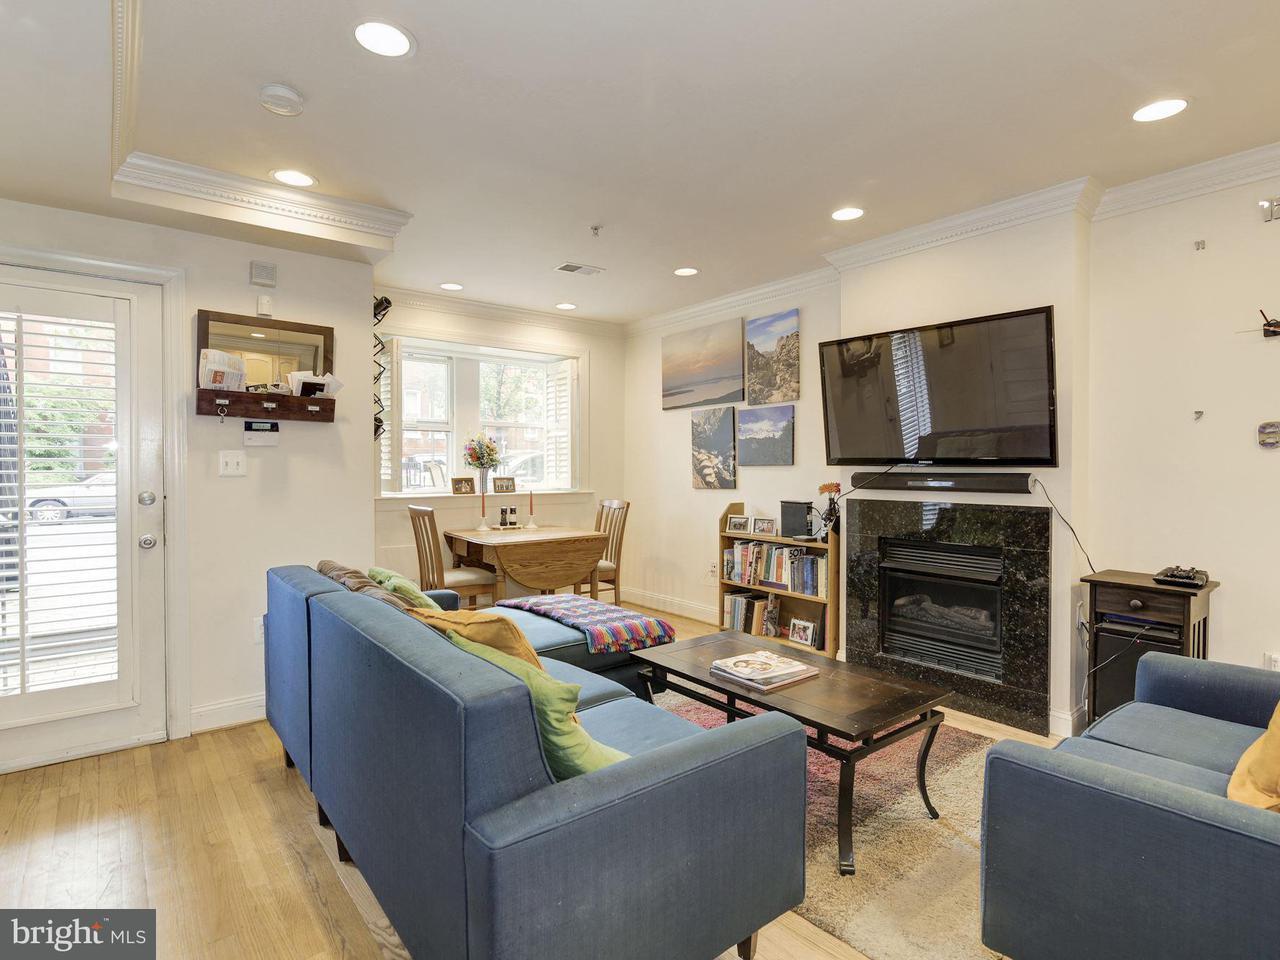 Single Family for Sale at 806 Maryland Ave NE #11 Washington, District Of Columbia 20002 United States